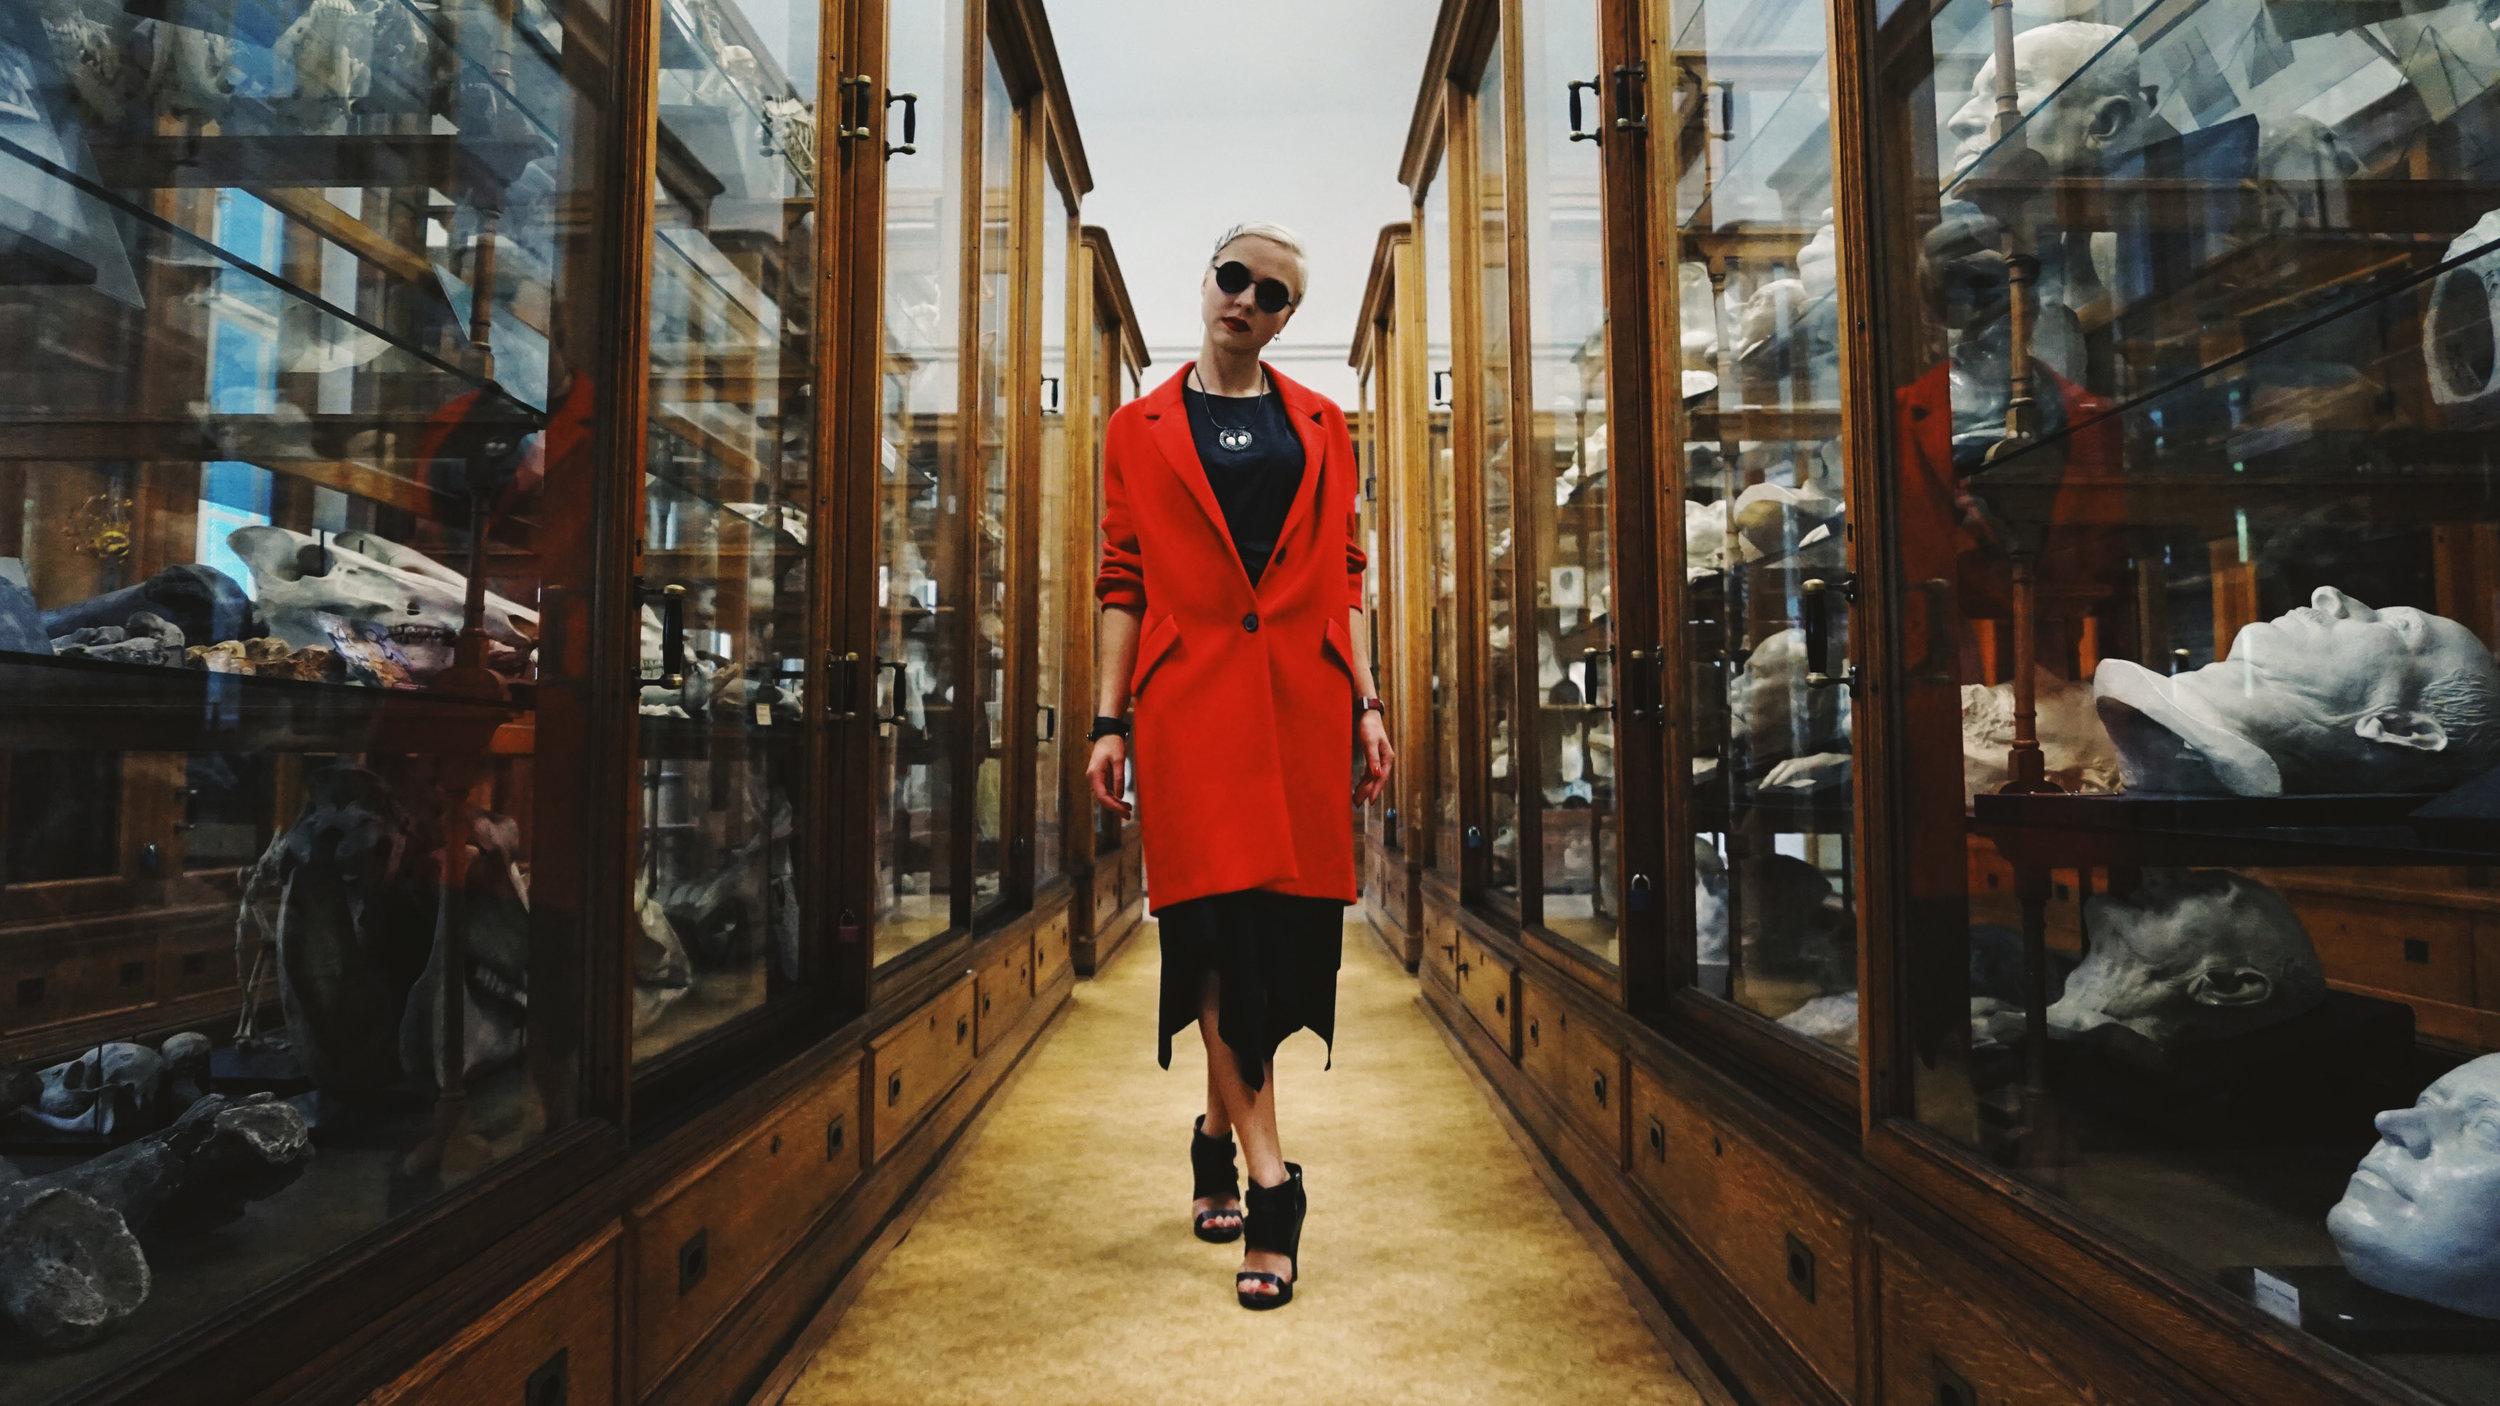 2018-Polina-Shubkina-Anastasia-Lagutina-Prague-Vampire-009.JPG